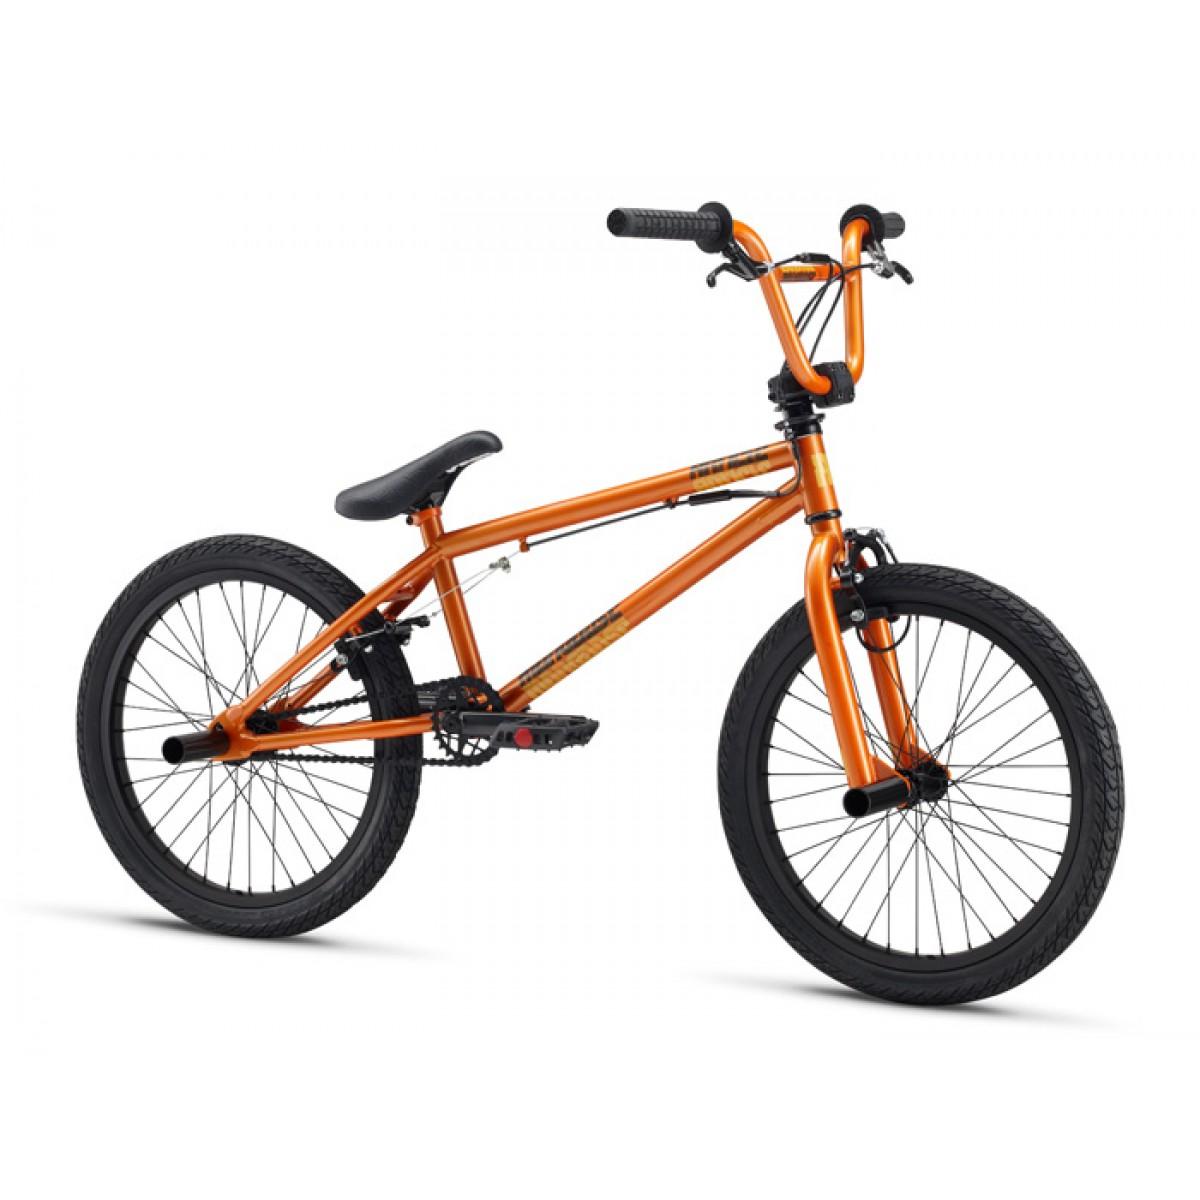 Mongoose Article 2013 BMX Bike